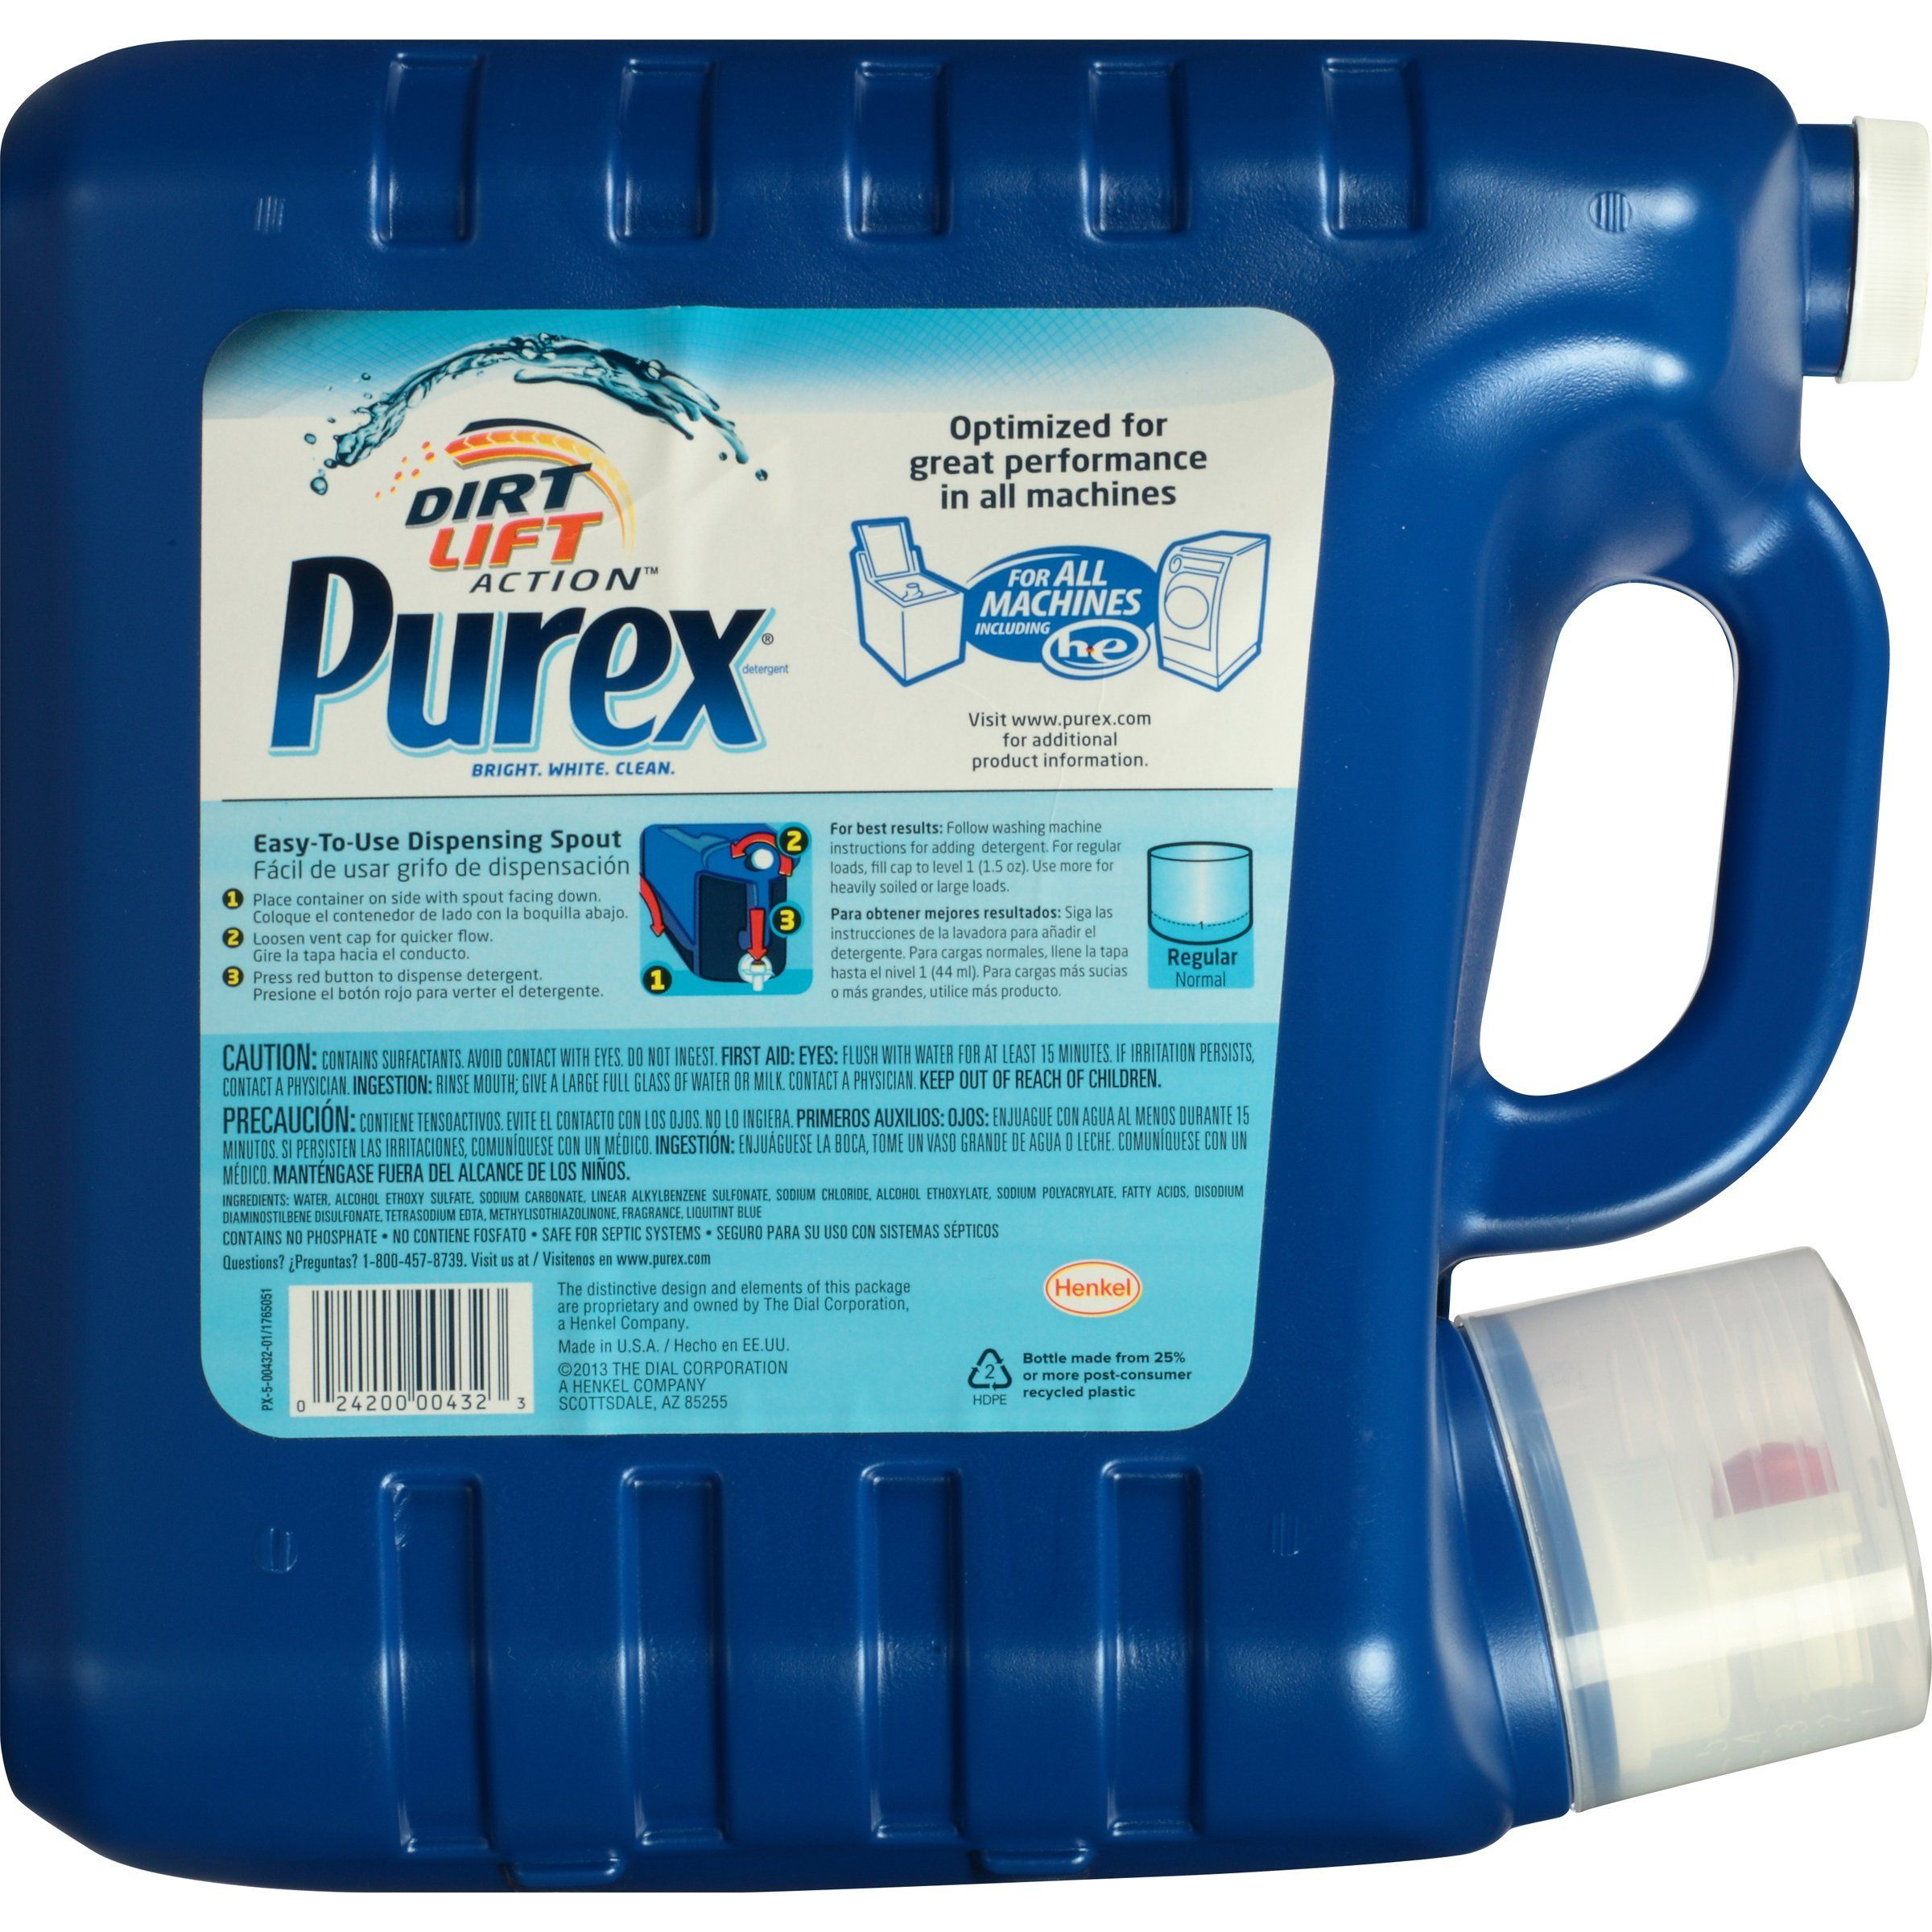 Purex Liquid Laundry Detergent Mountain Breeze 300 Oz 200 Loads Click Image For More Details This Is An Aff Baby Detergent Purex Liquid Laundry Detergent